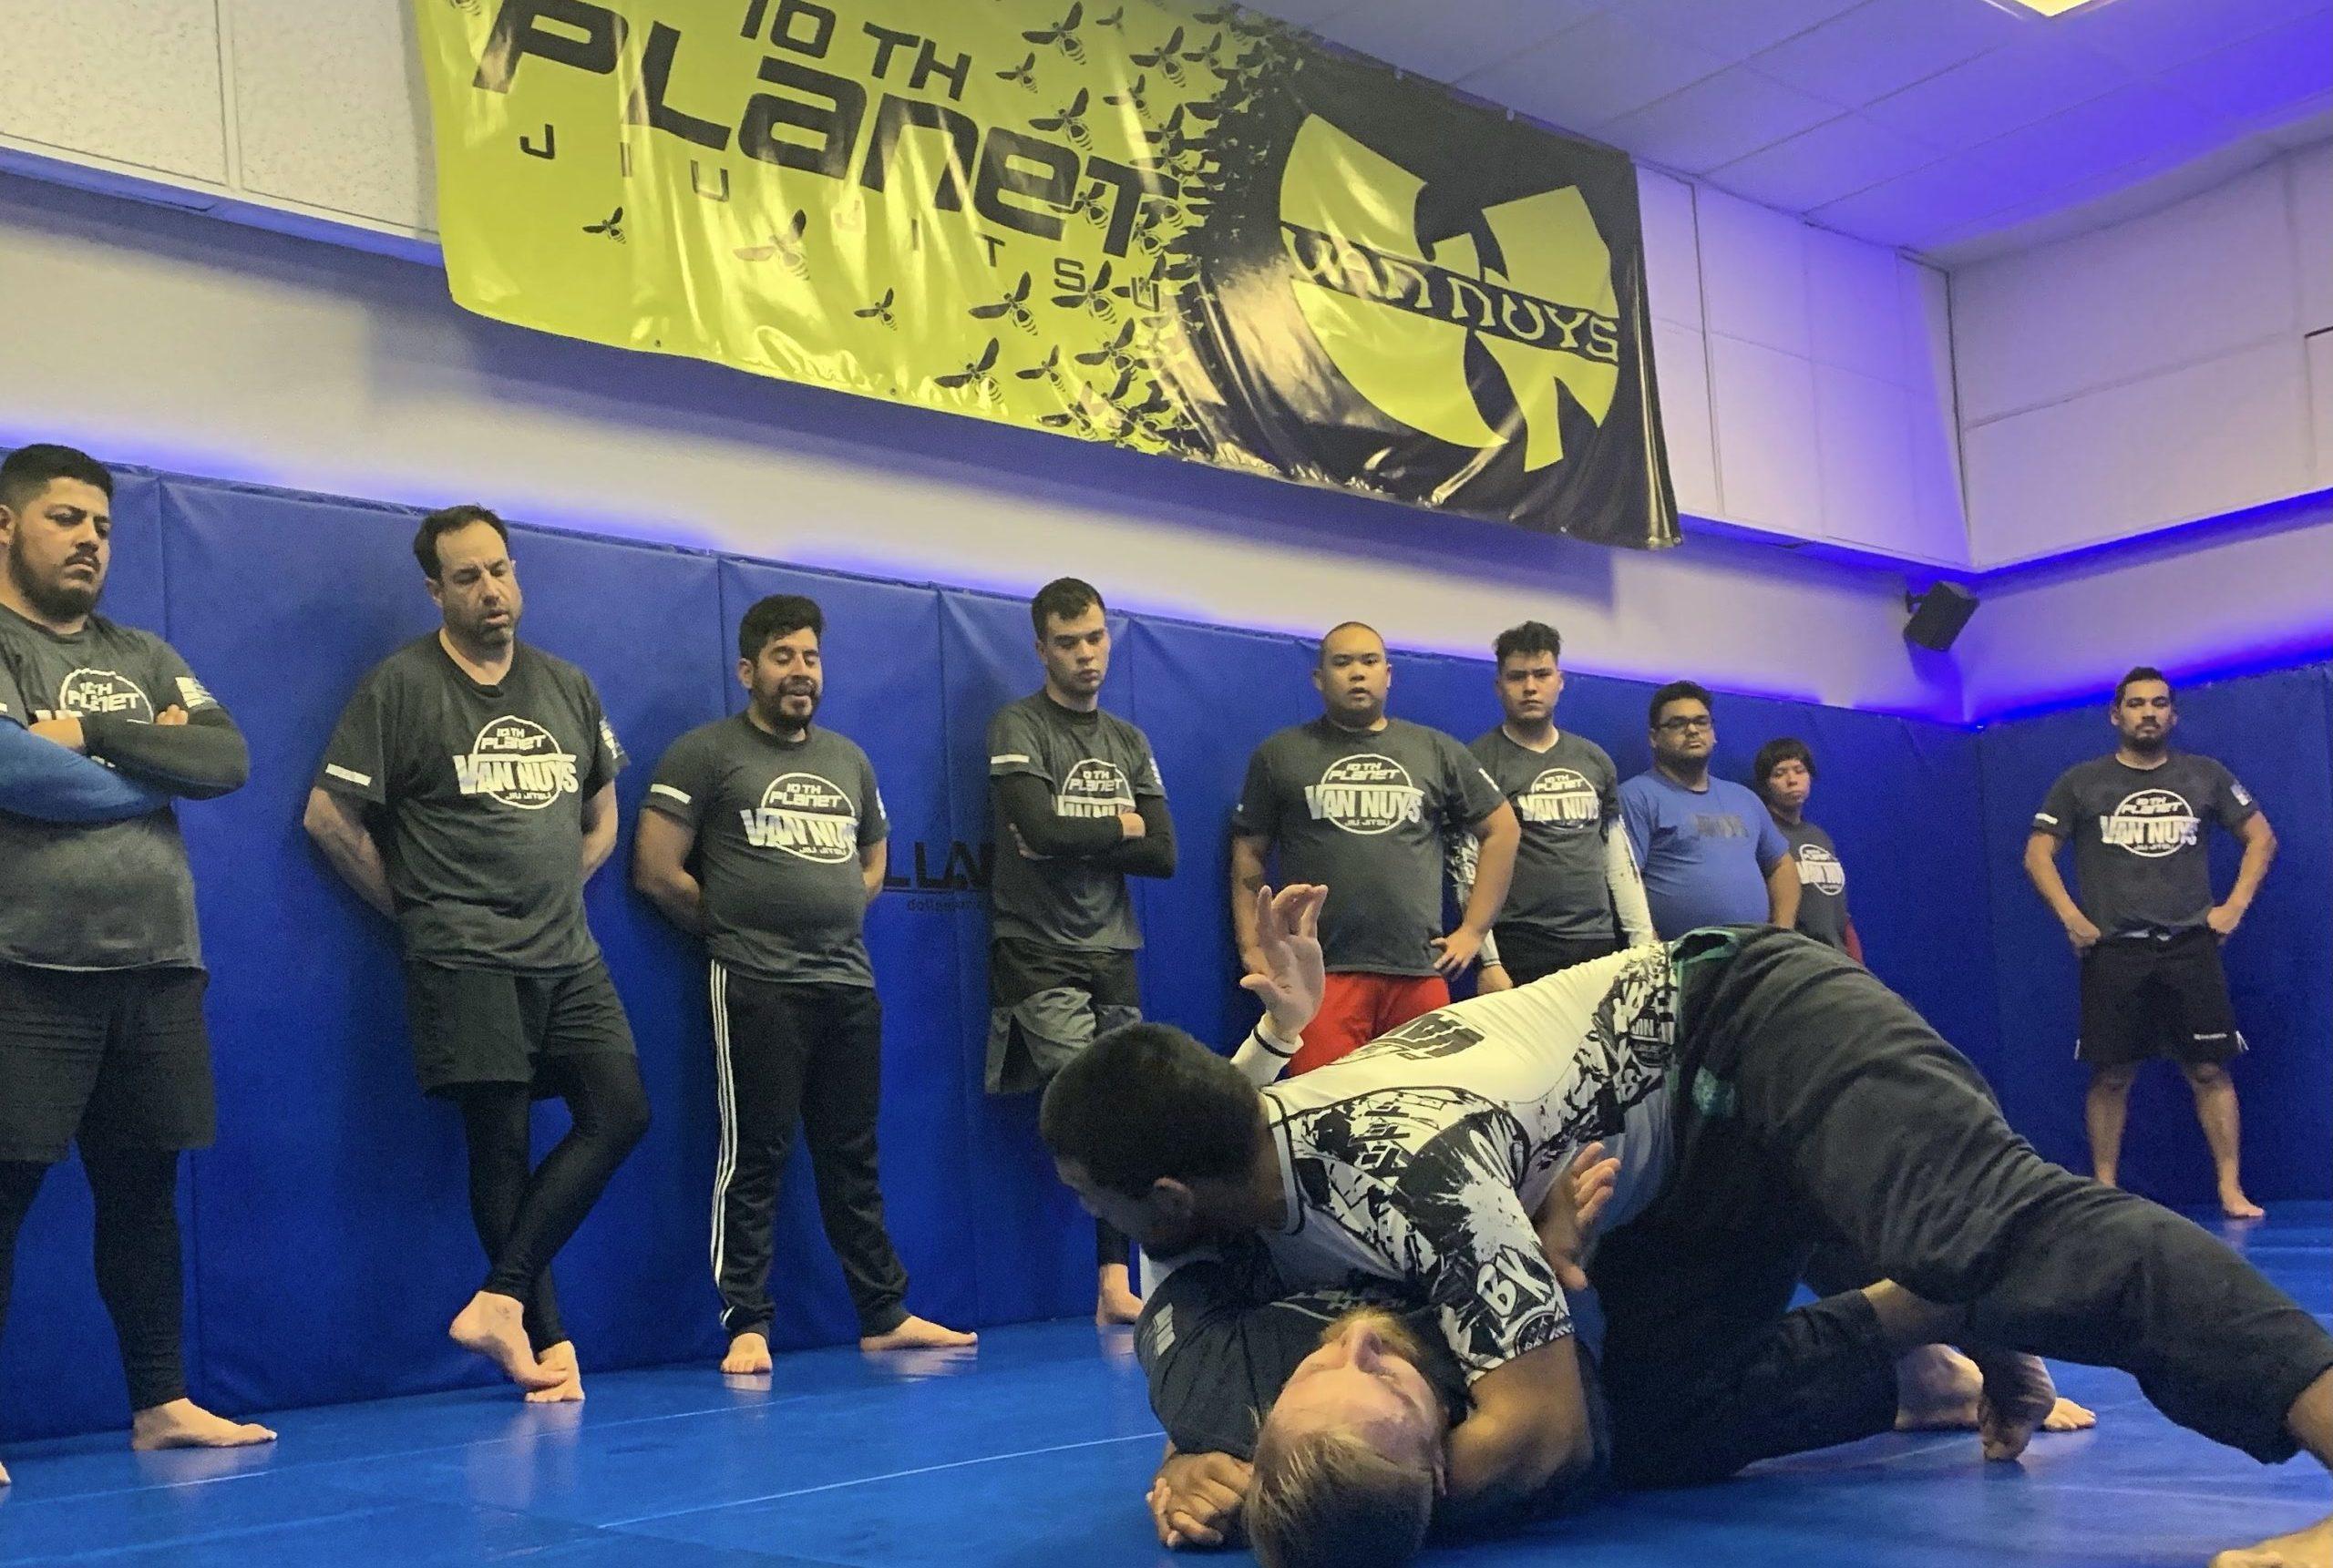 Fundamental Jiu Jitsu